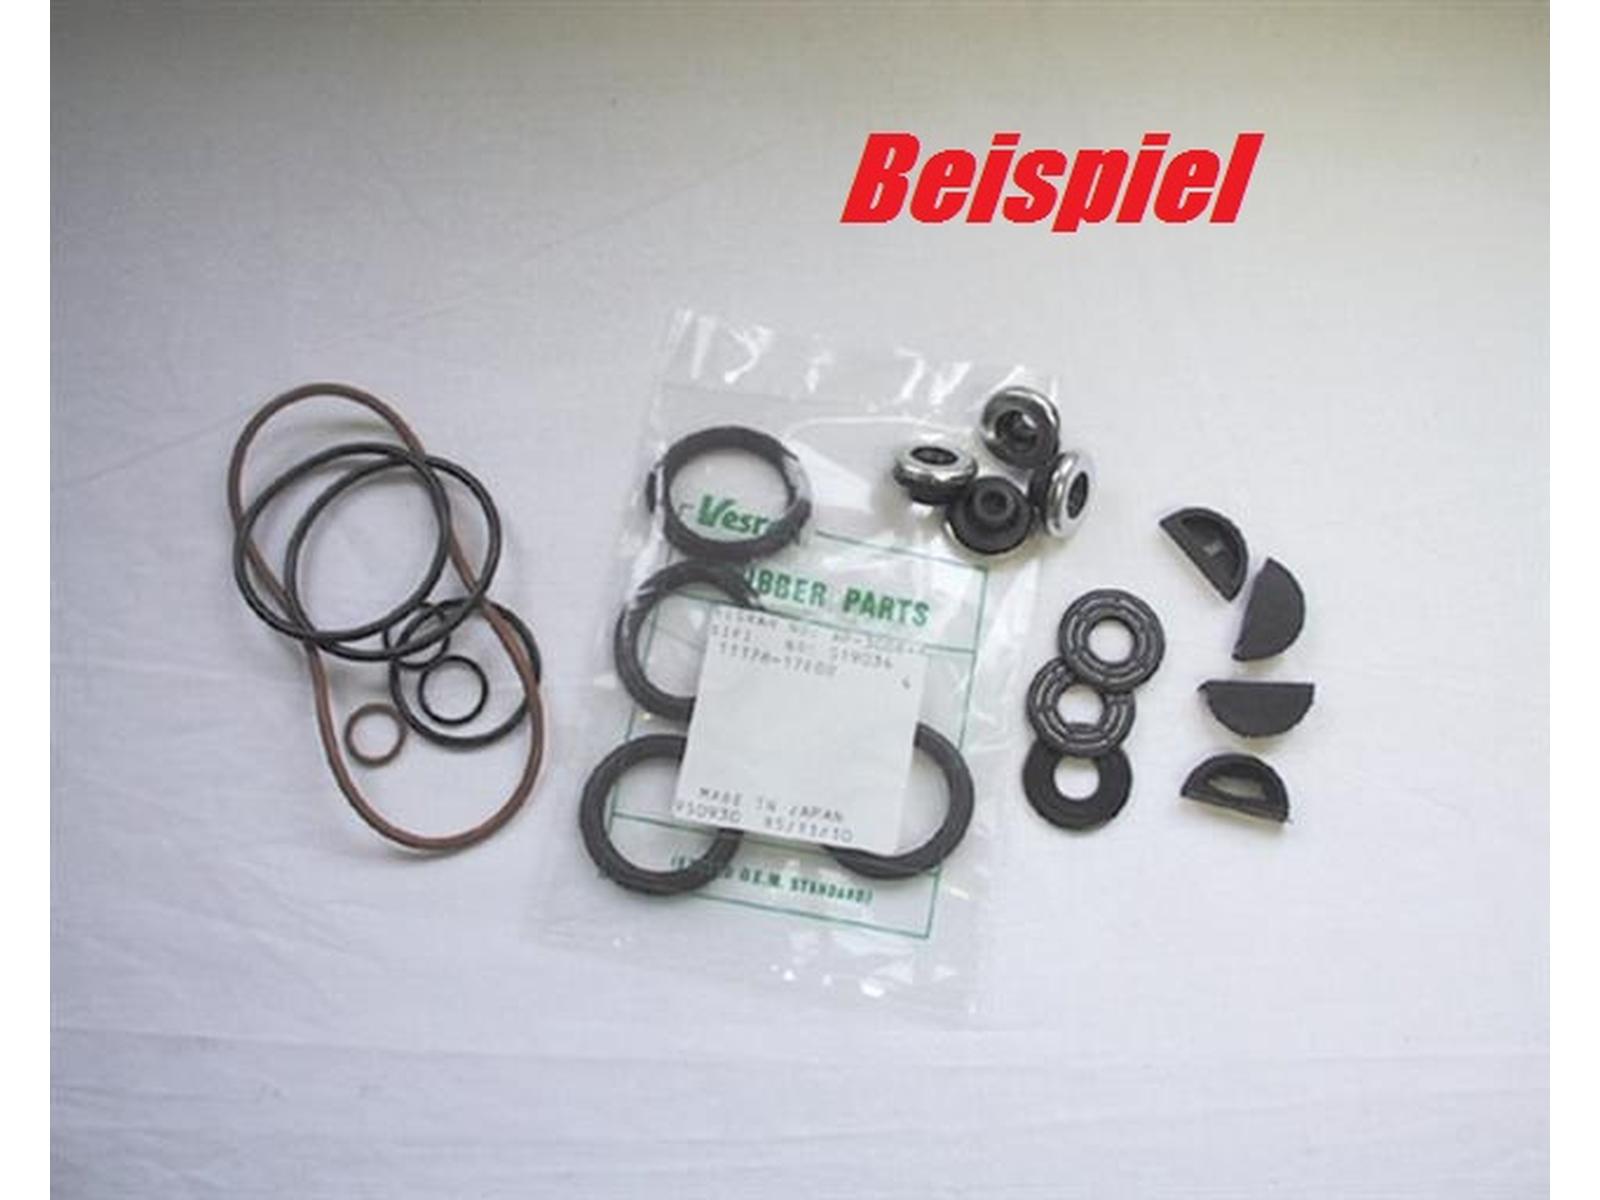 Ventildeckeldichtung Kawasaki Z 750 B 2 Zylinder